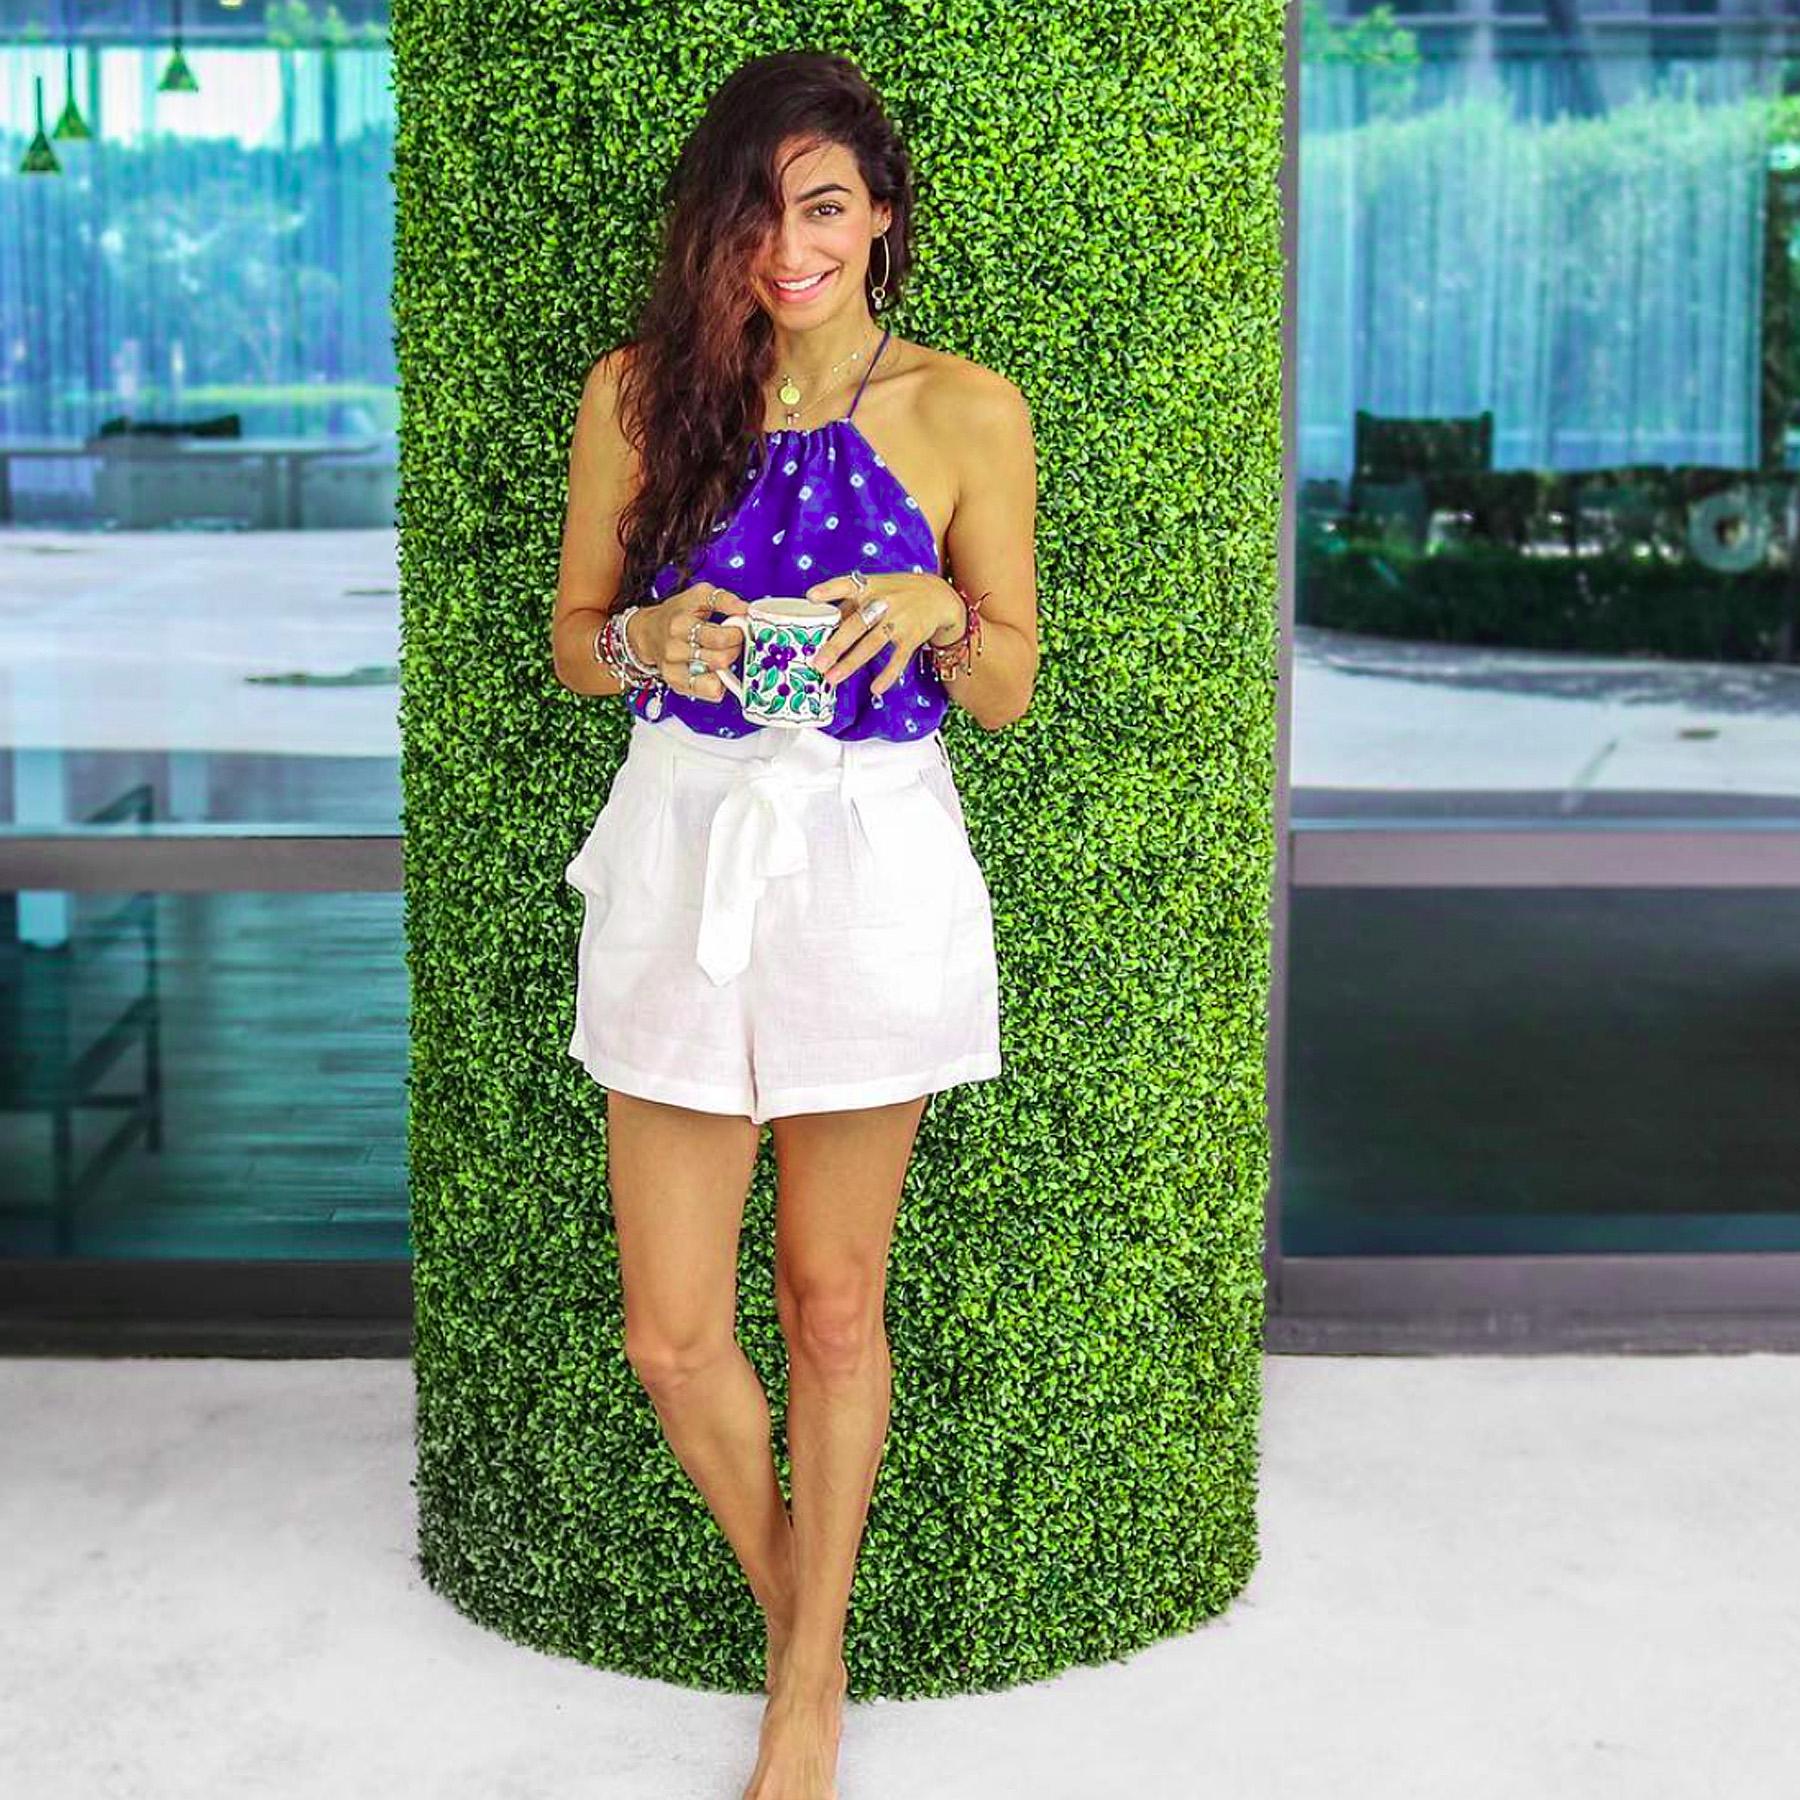 Valeria Hinojosa, instagram, moda sostenible, influencer